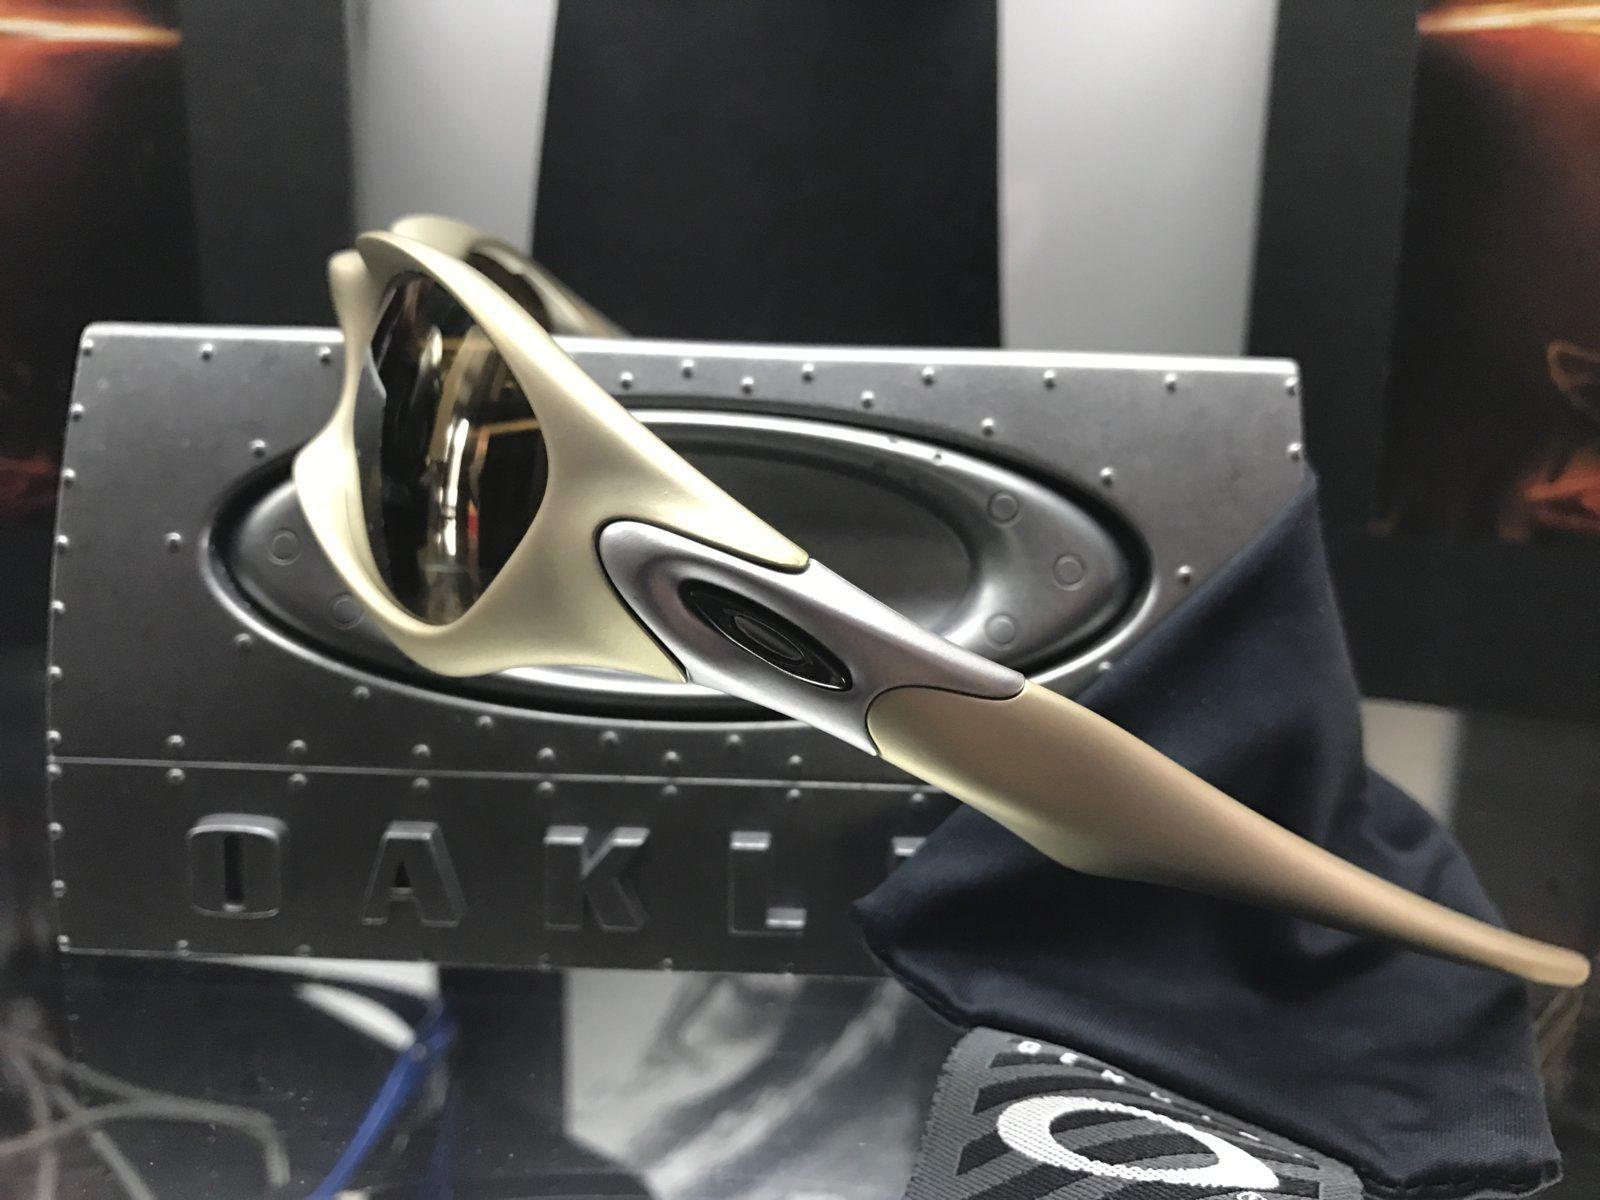 Valve FMJ Platinum - FMJ+ w/ gold iridium - $110 - IMG_6348.JPG